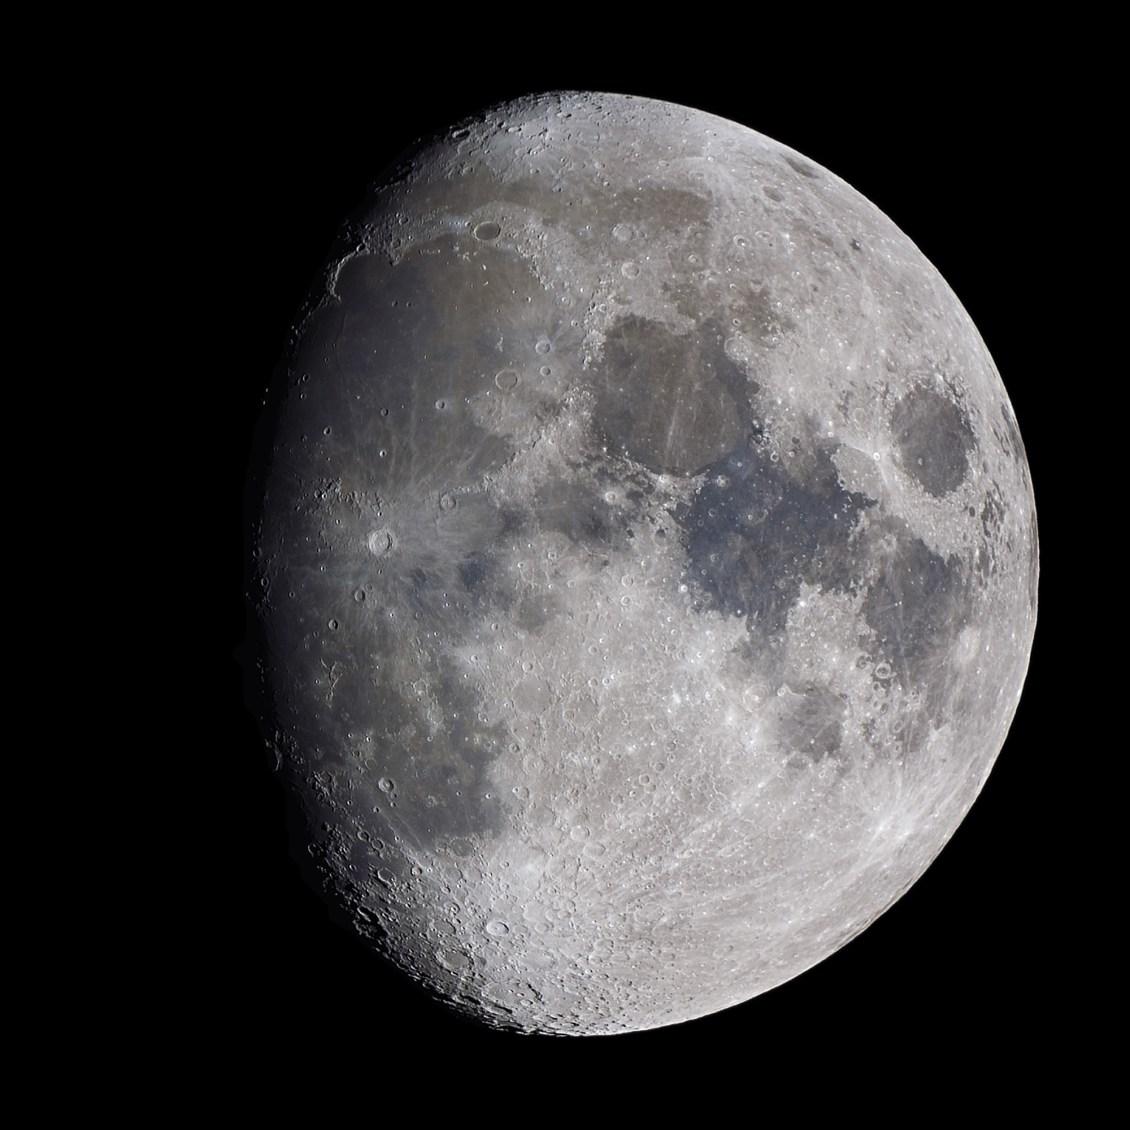 a Waxing Gibbous Moon is seen in the sky